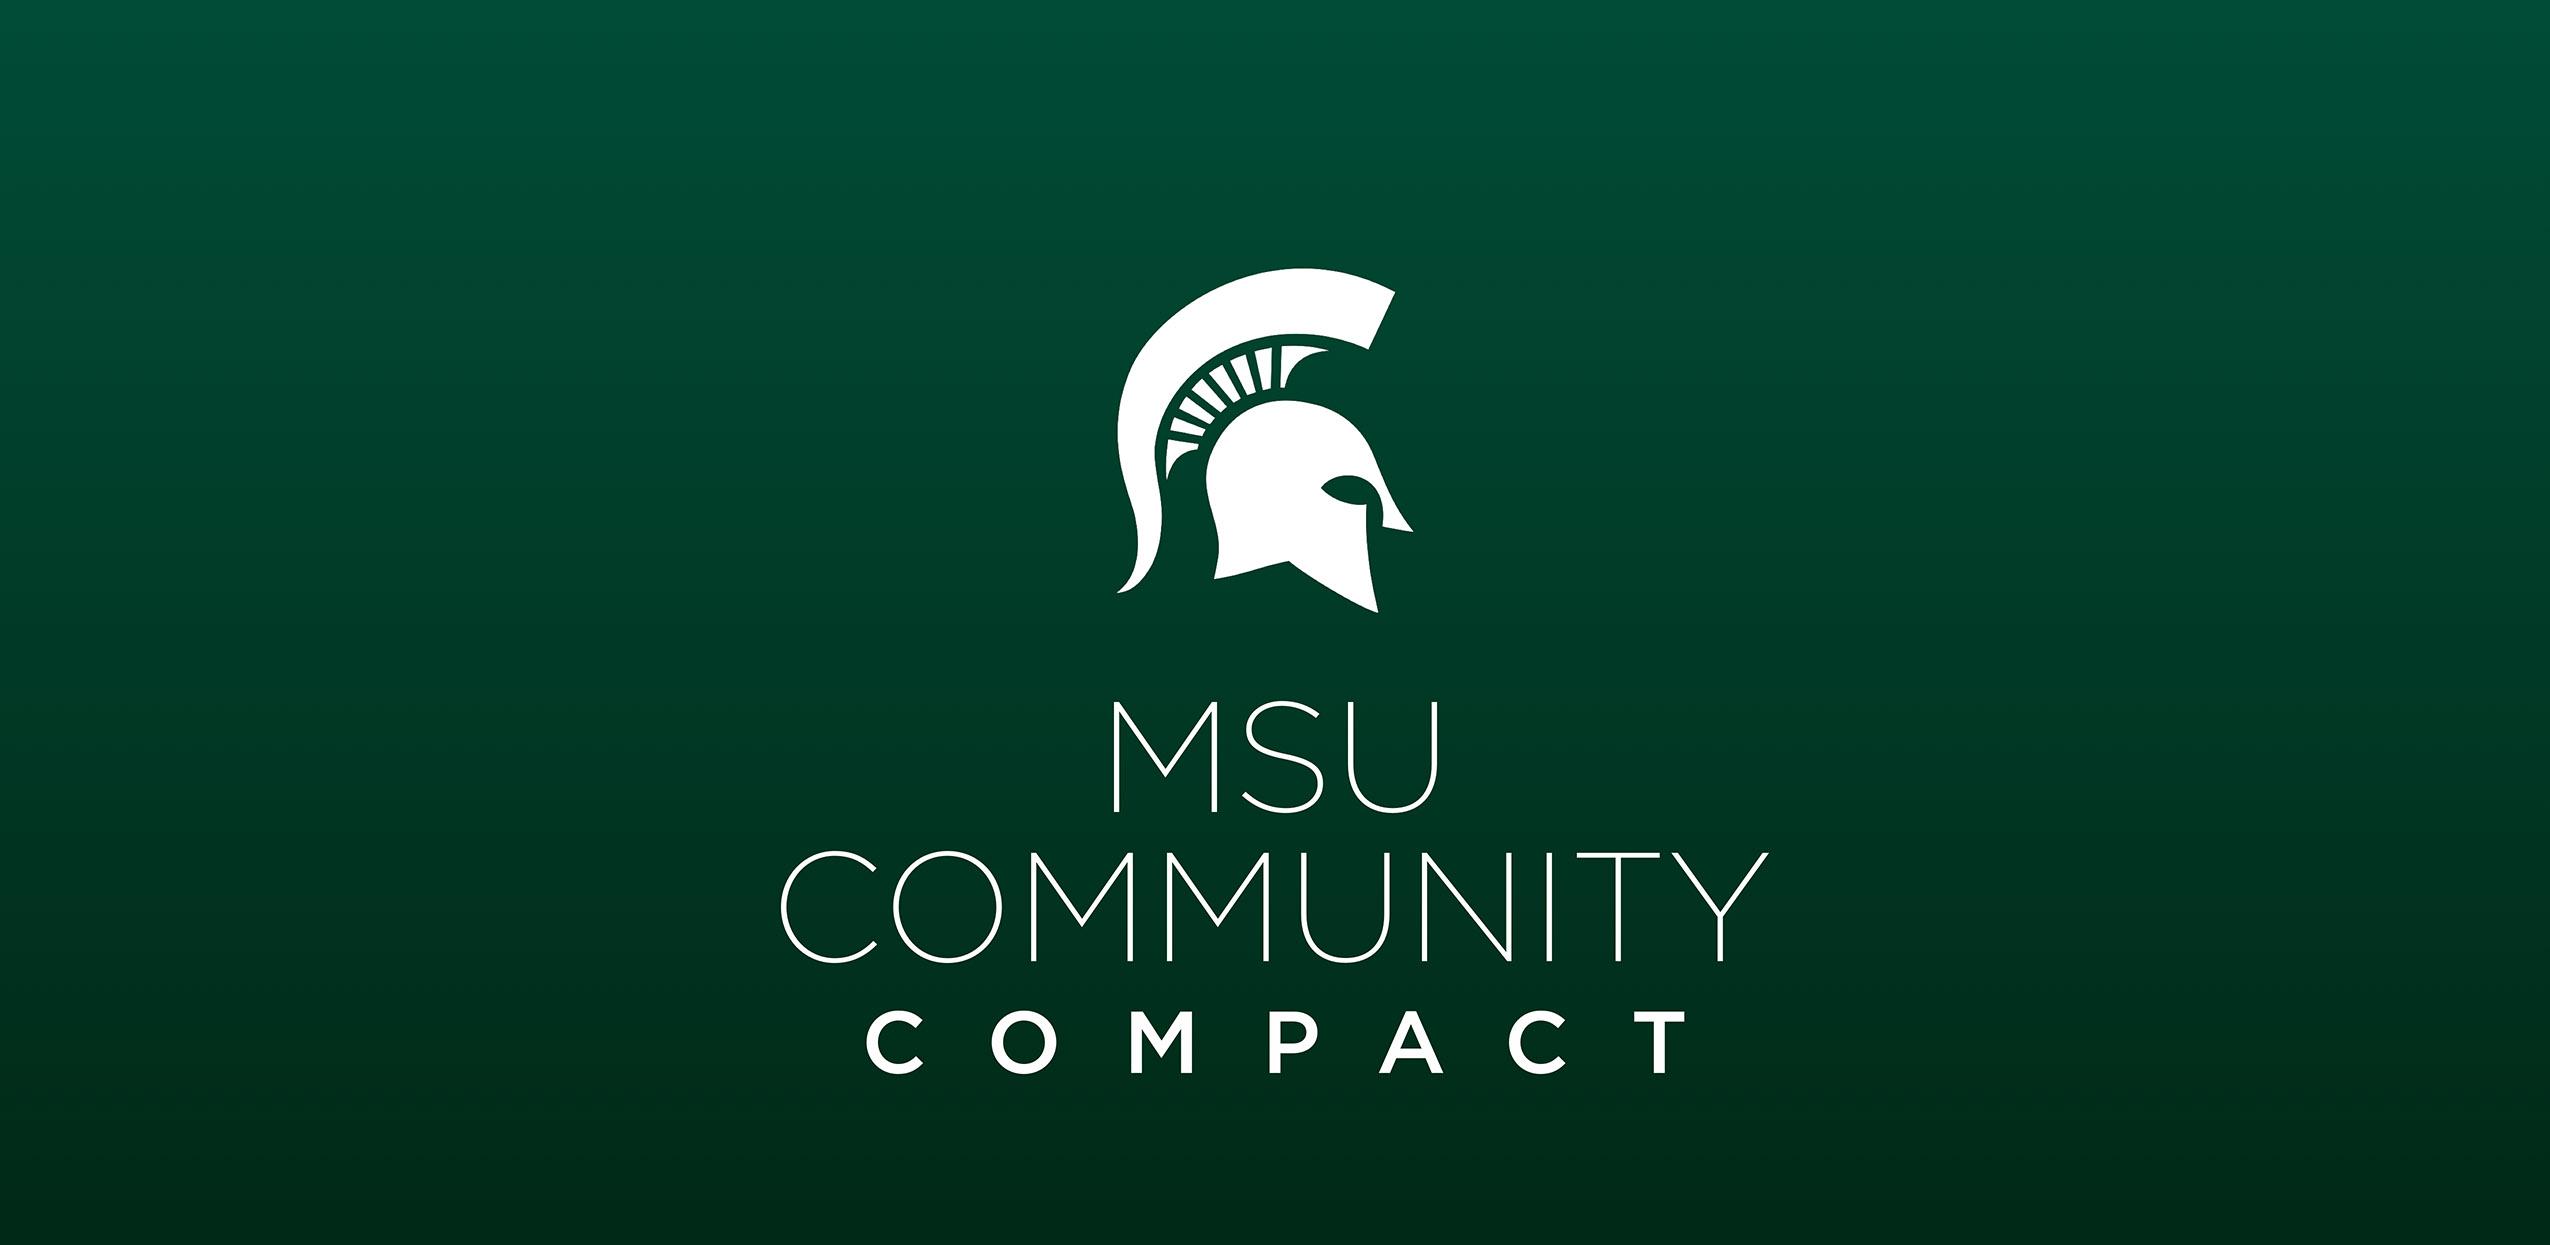 MSU Community Compact